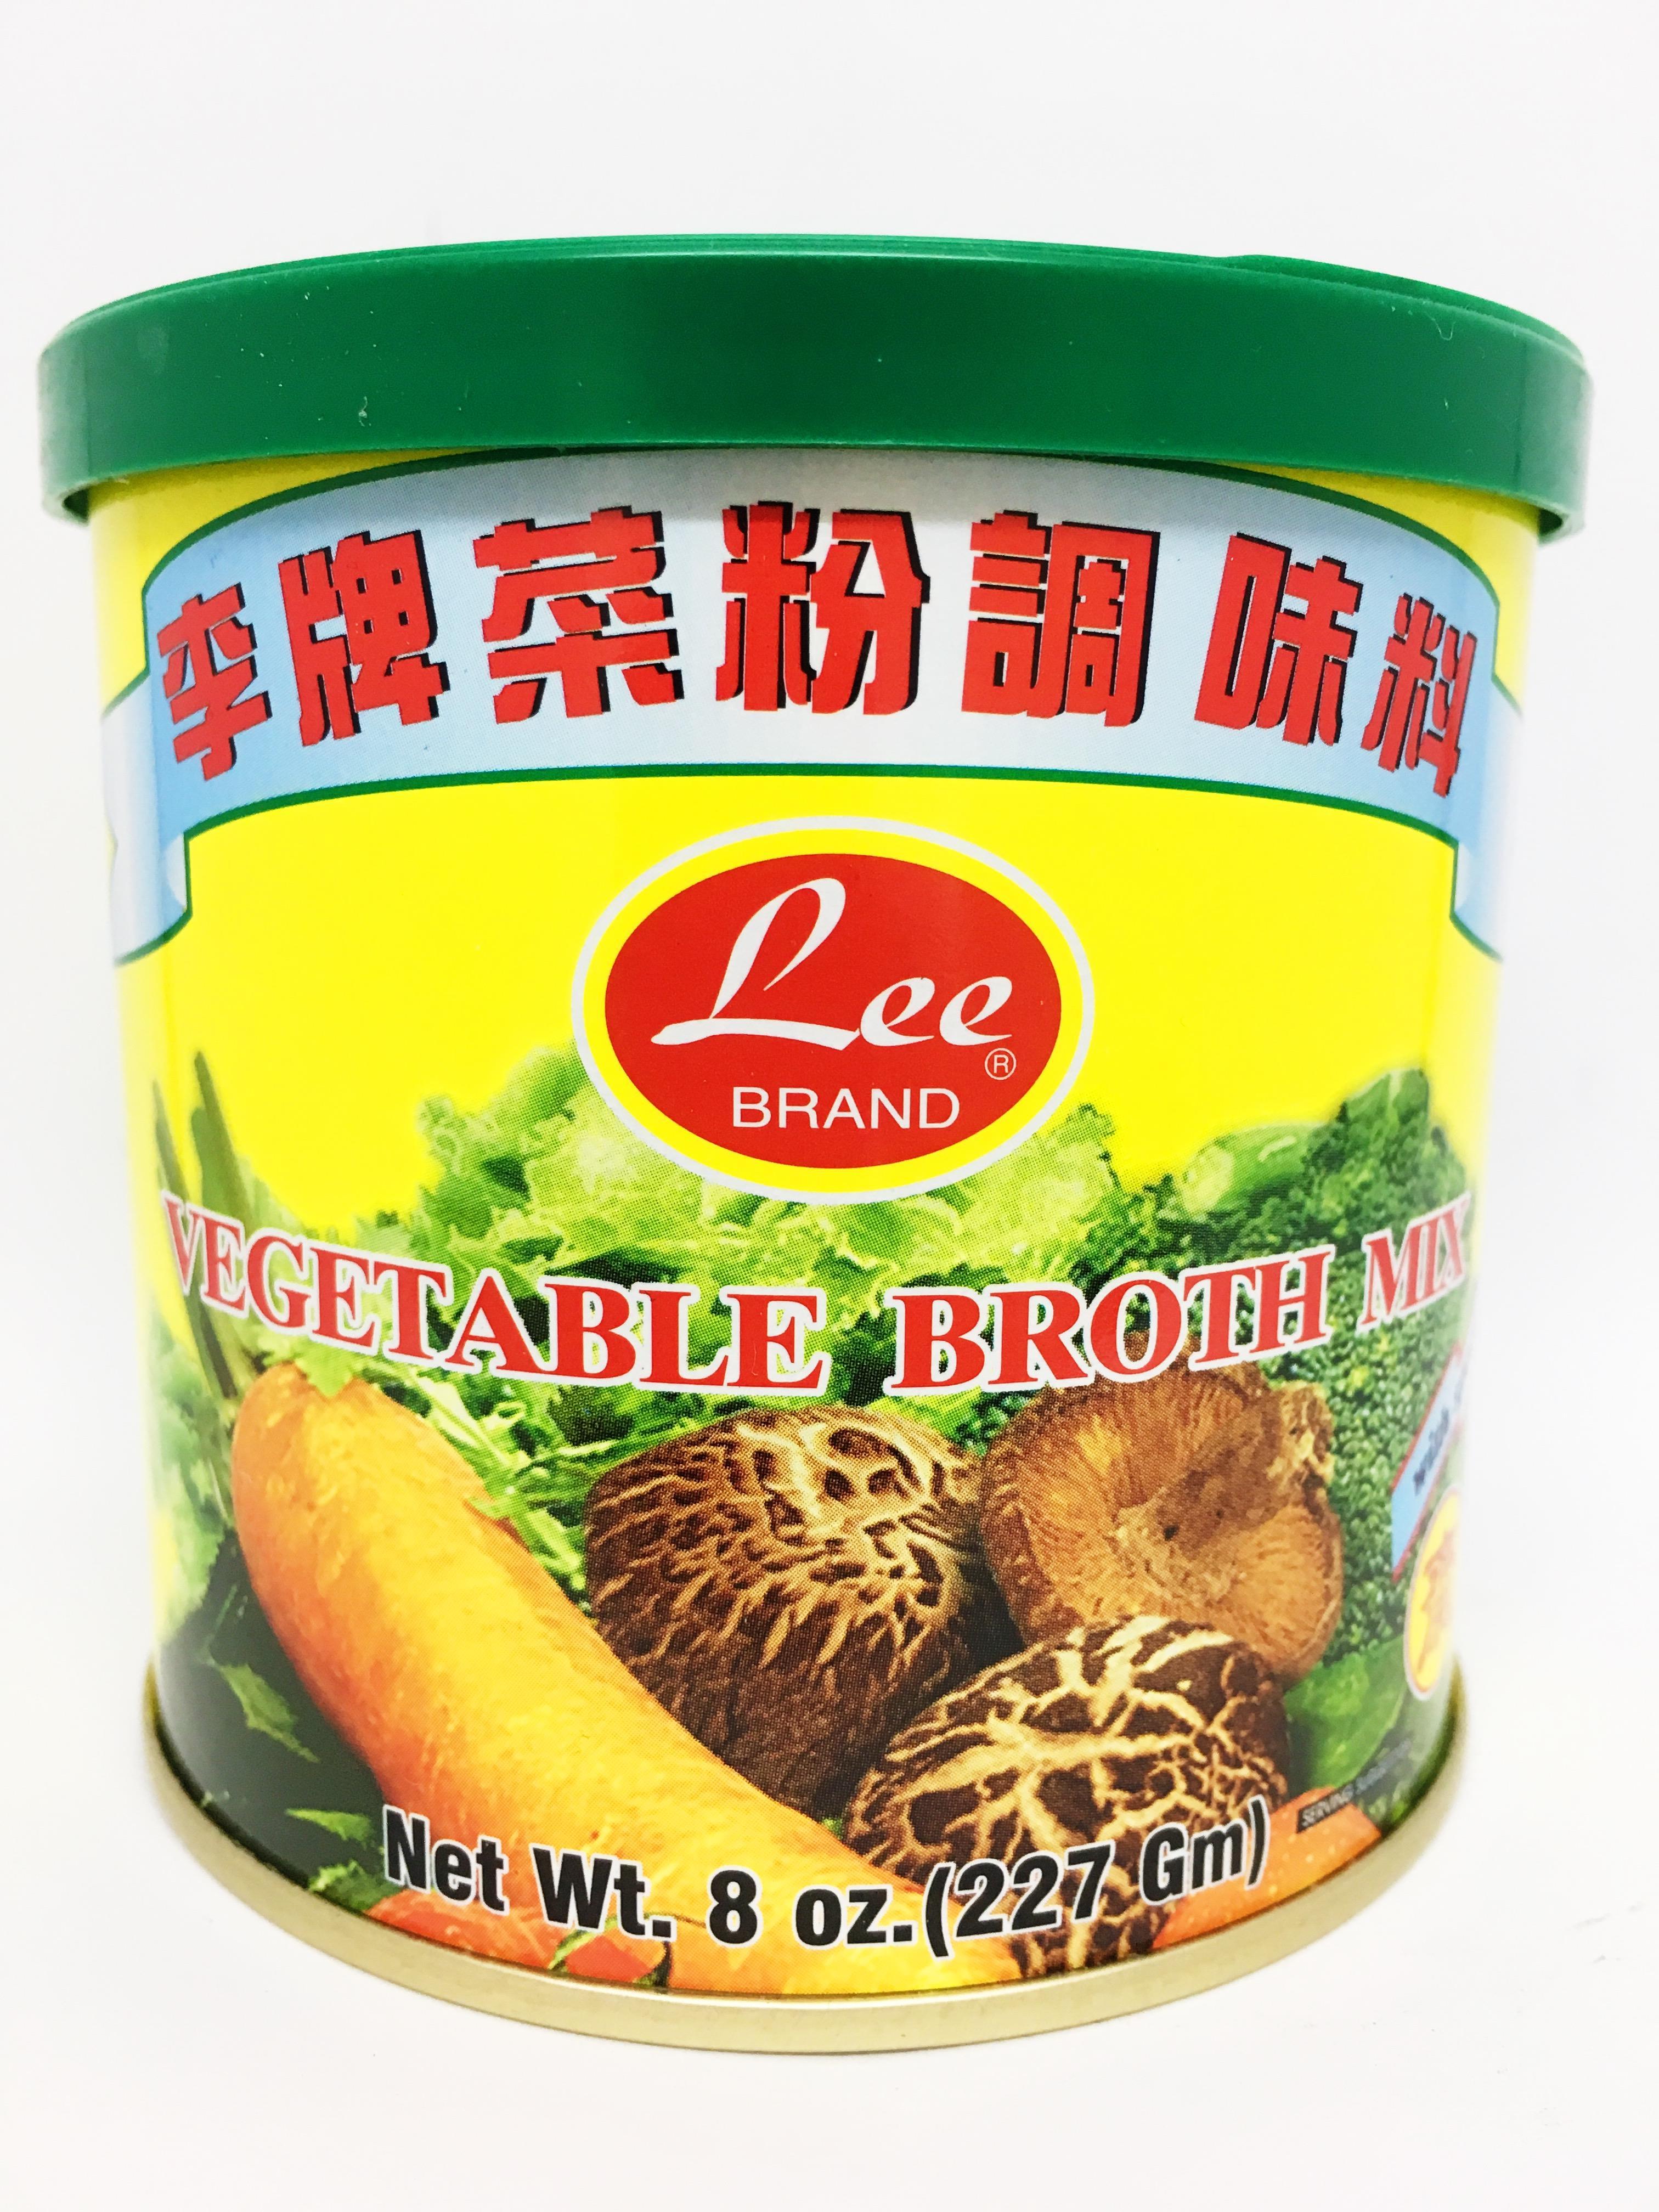 LEE Vegetable Broth Mix 8 OZ